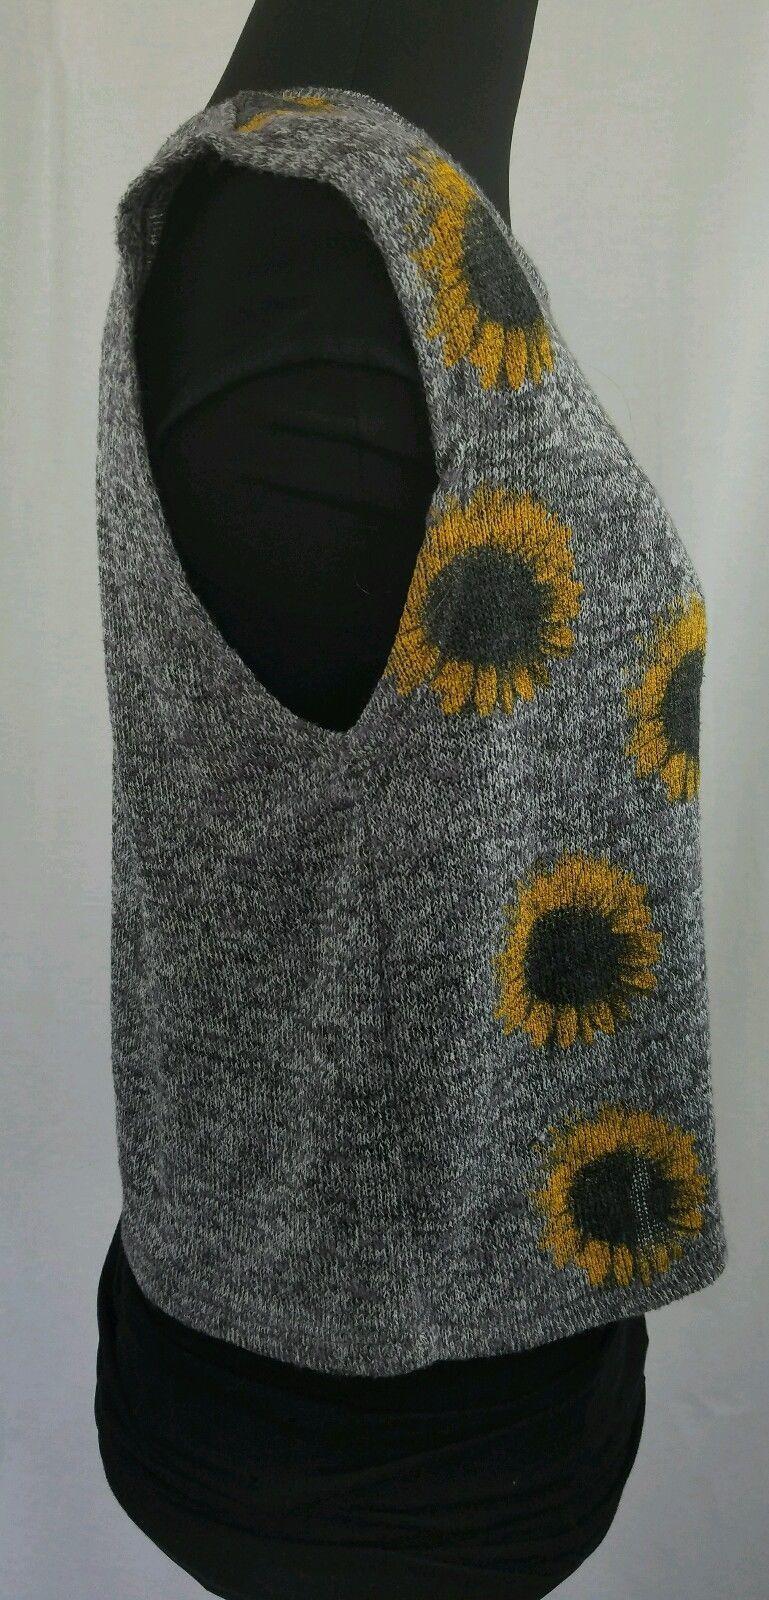 Sunflower Gray Knit Top Floral Front Round Neckline Sleeveless Size M